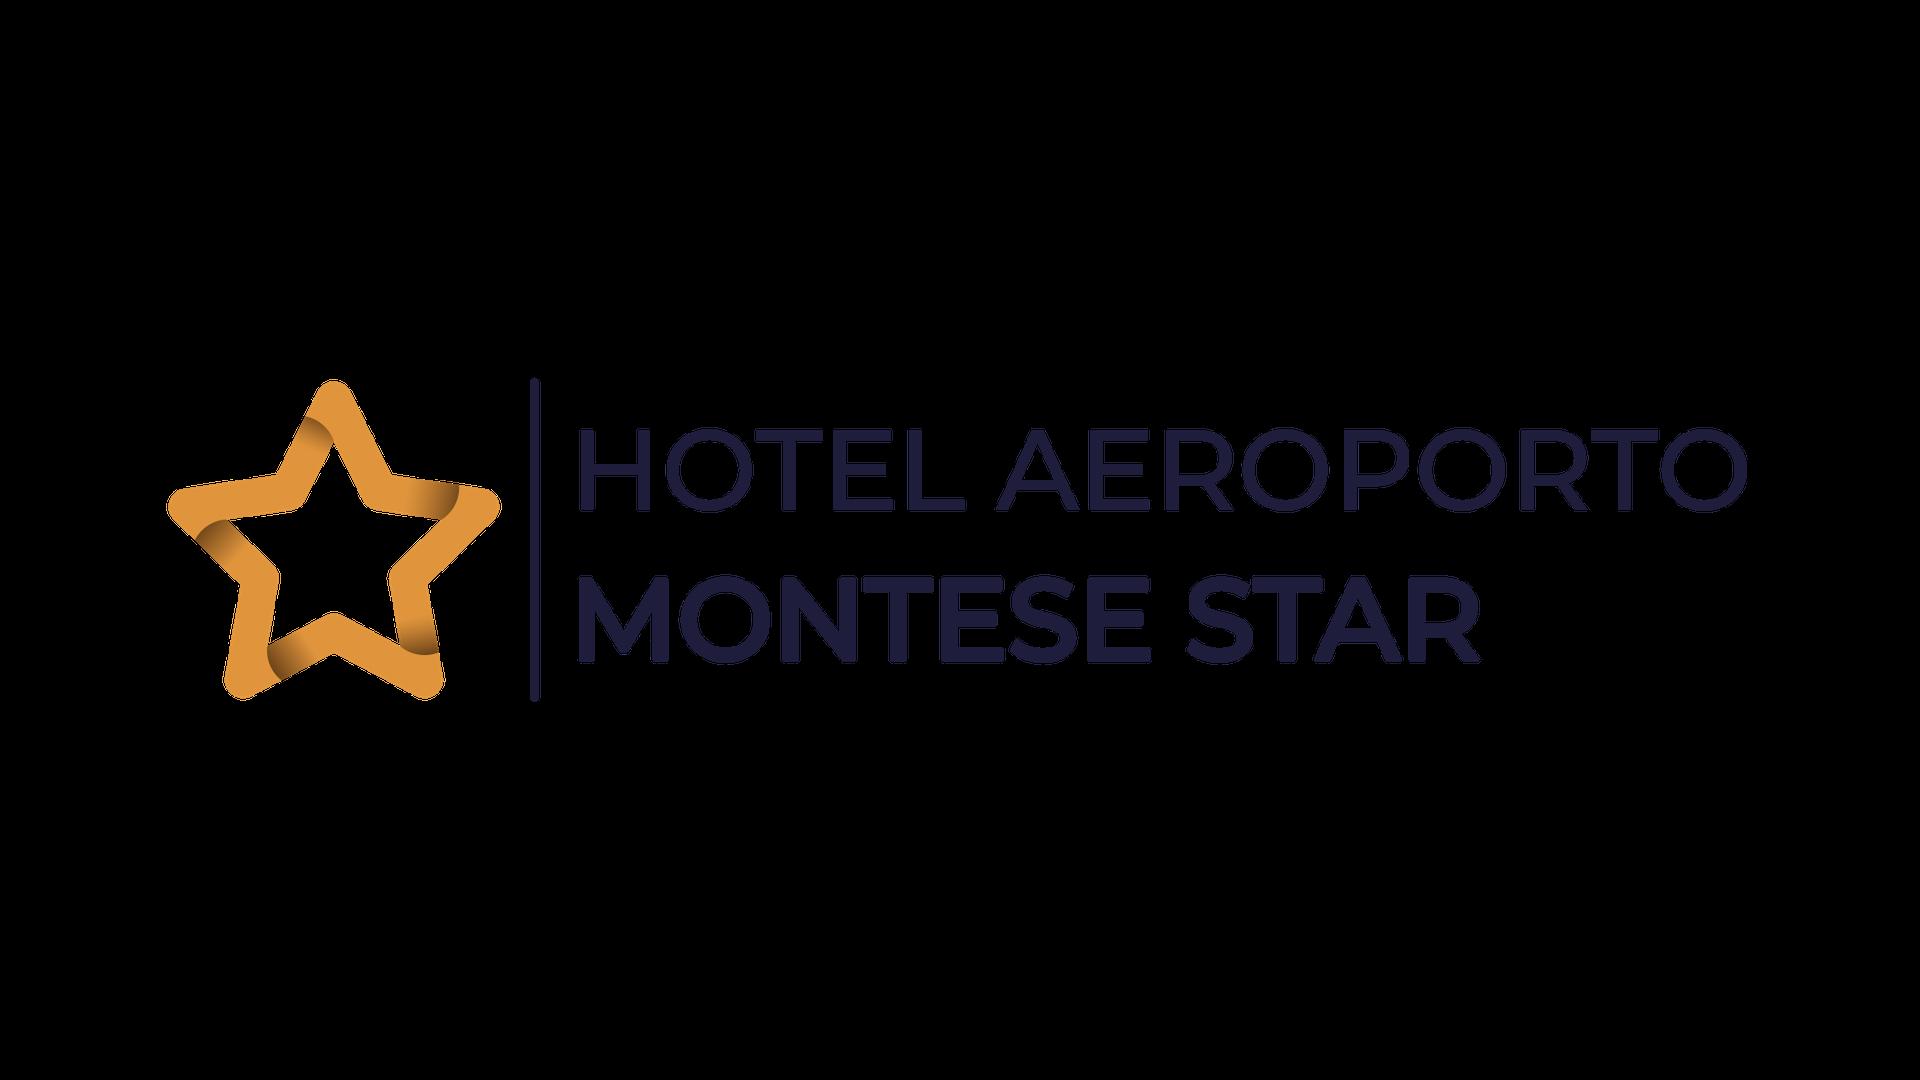 Montese Star Hotel